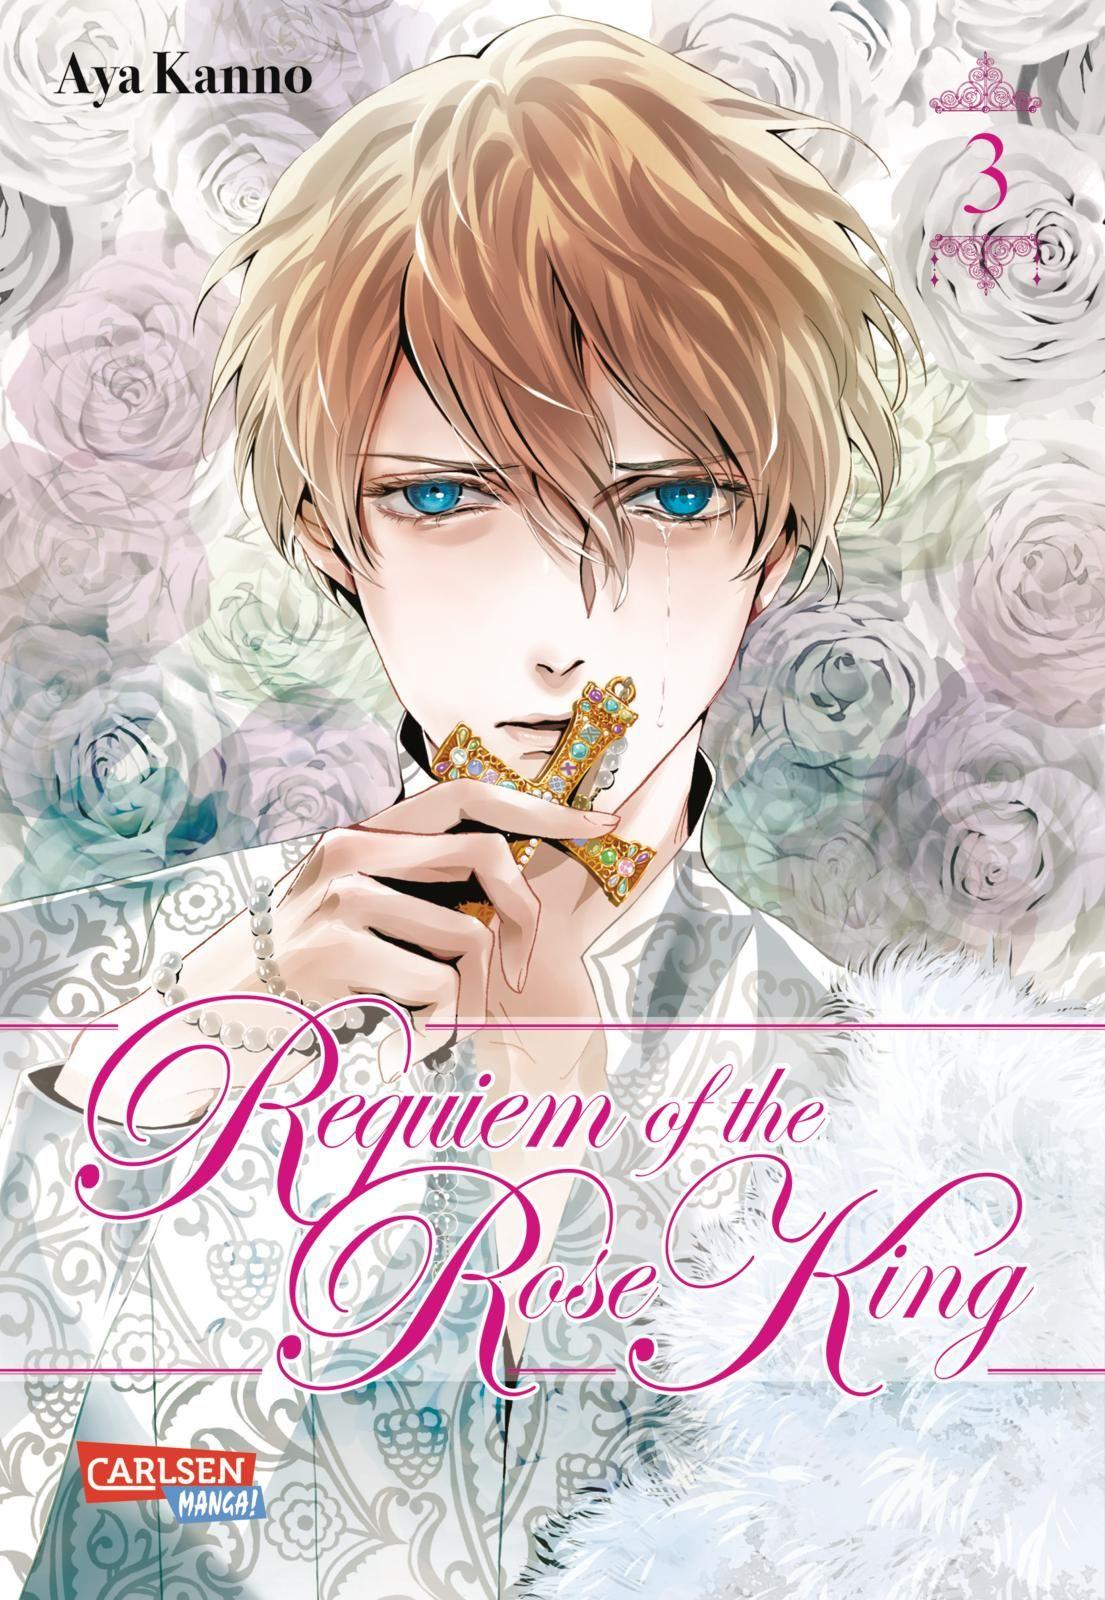 Aya-Kanno-Requiem-of-the-Rose-King-3